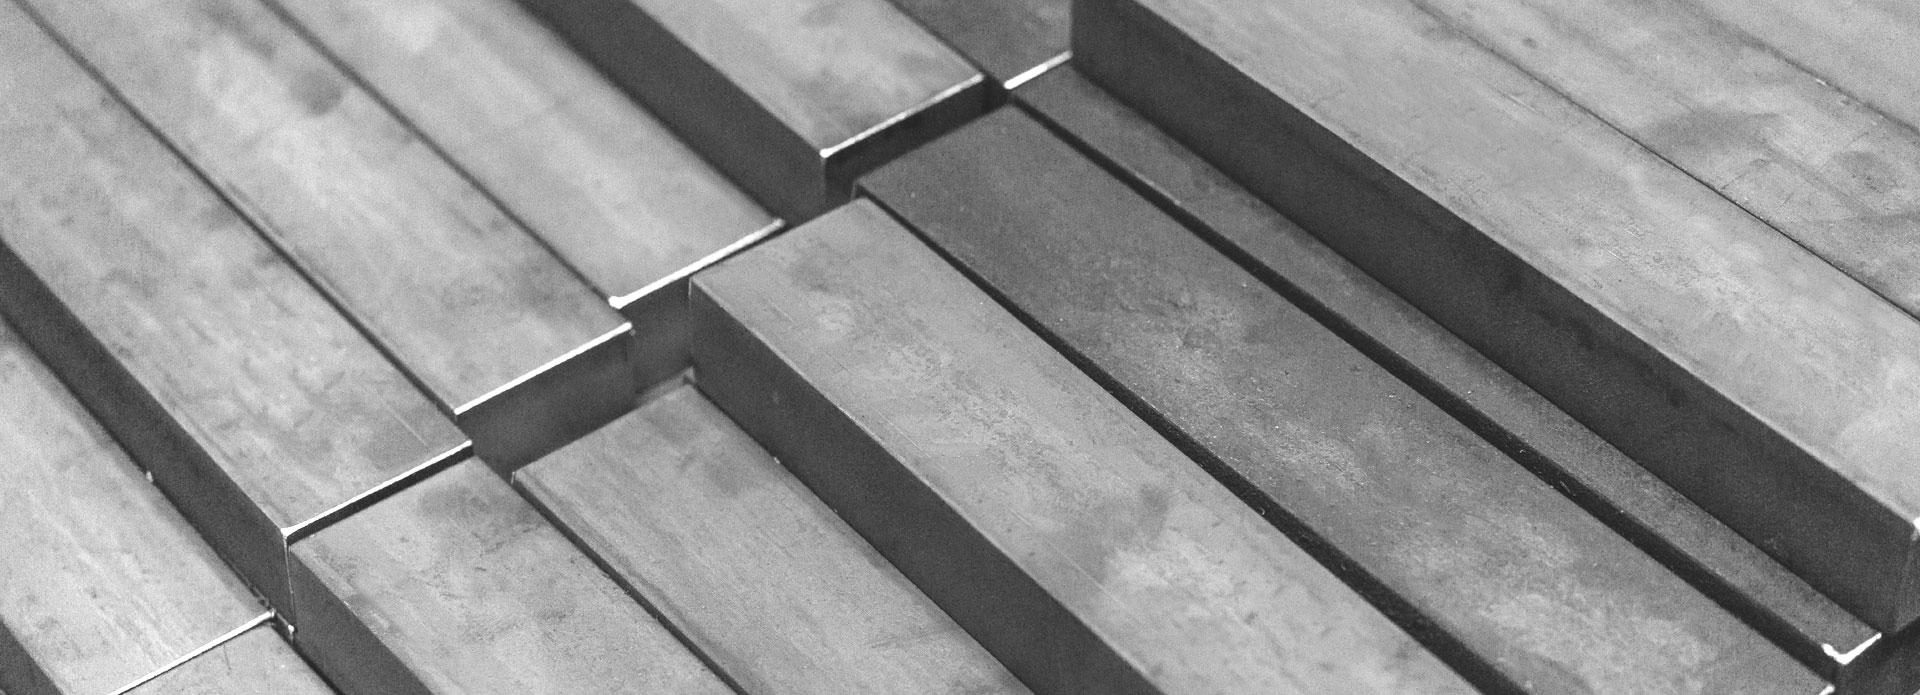 Stainless Steel Header Image